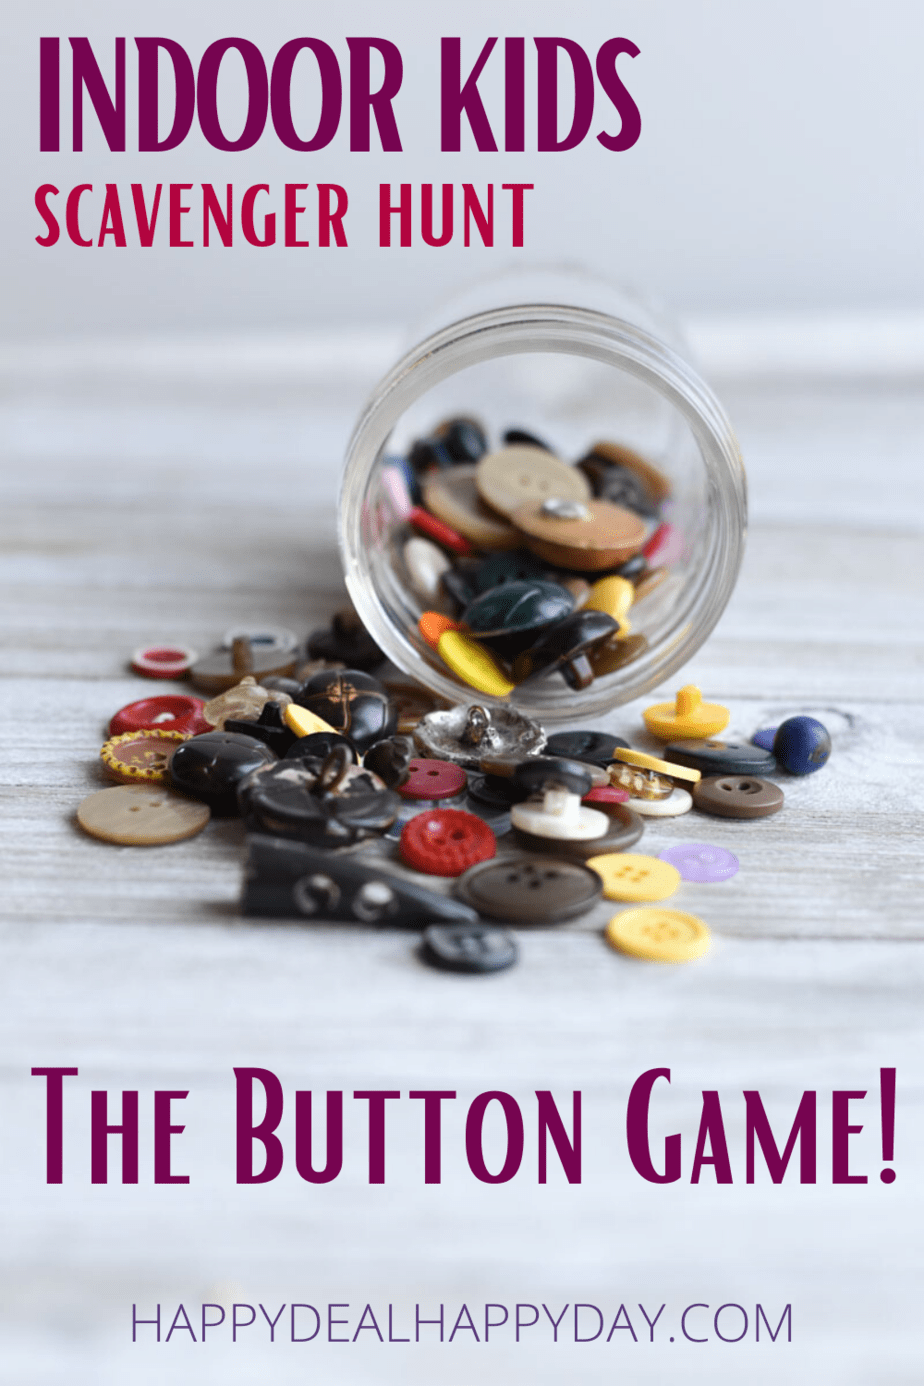 Indoor kids scavenger hunt button game